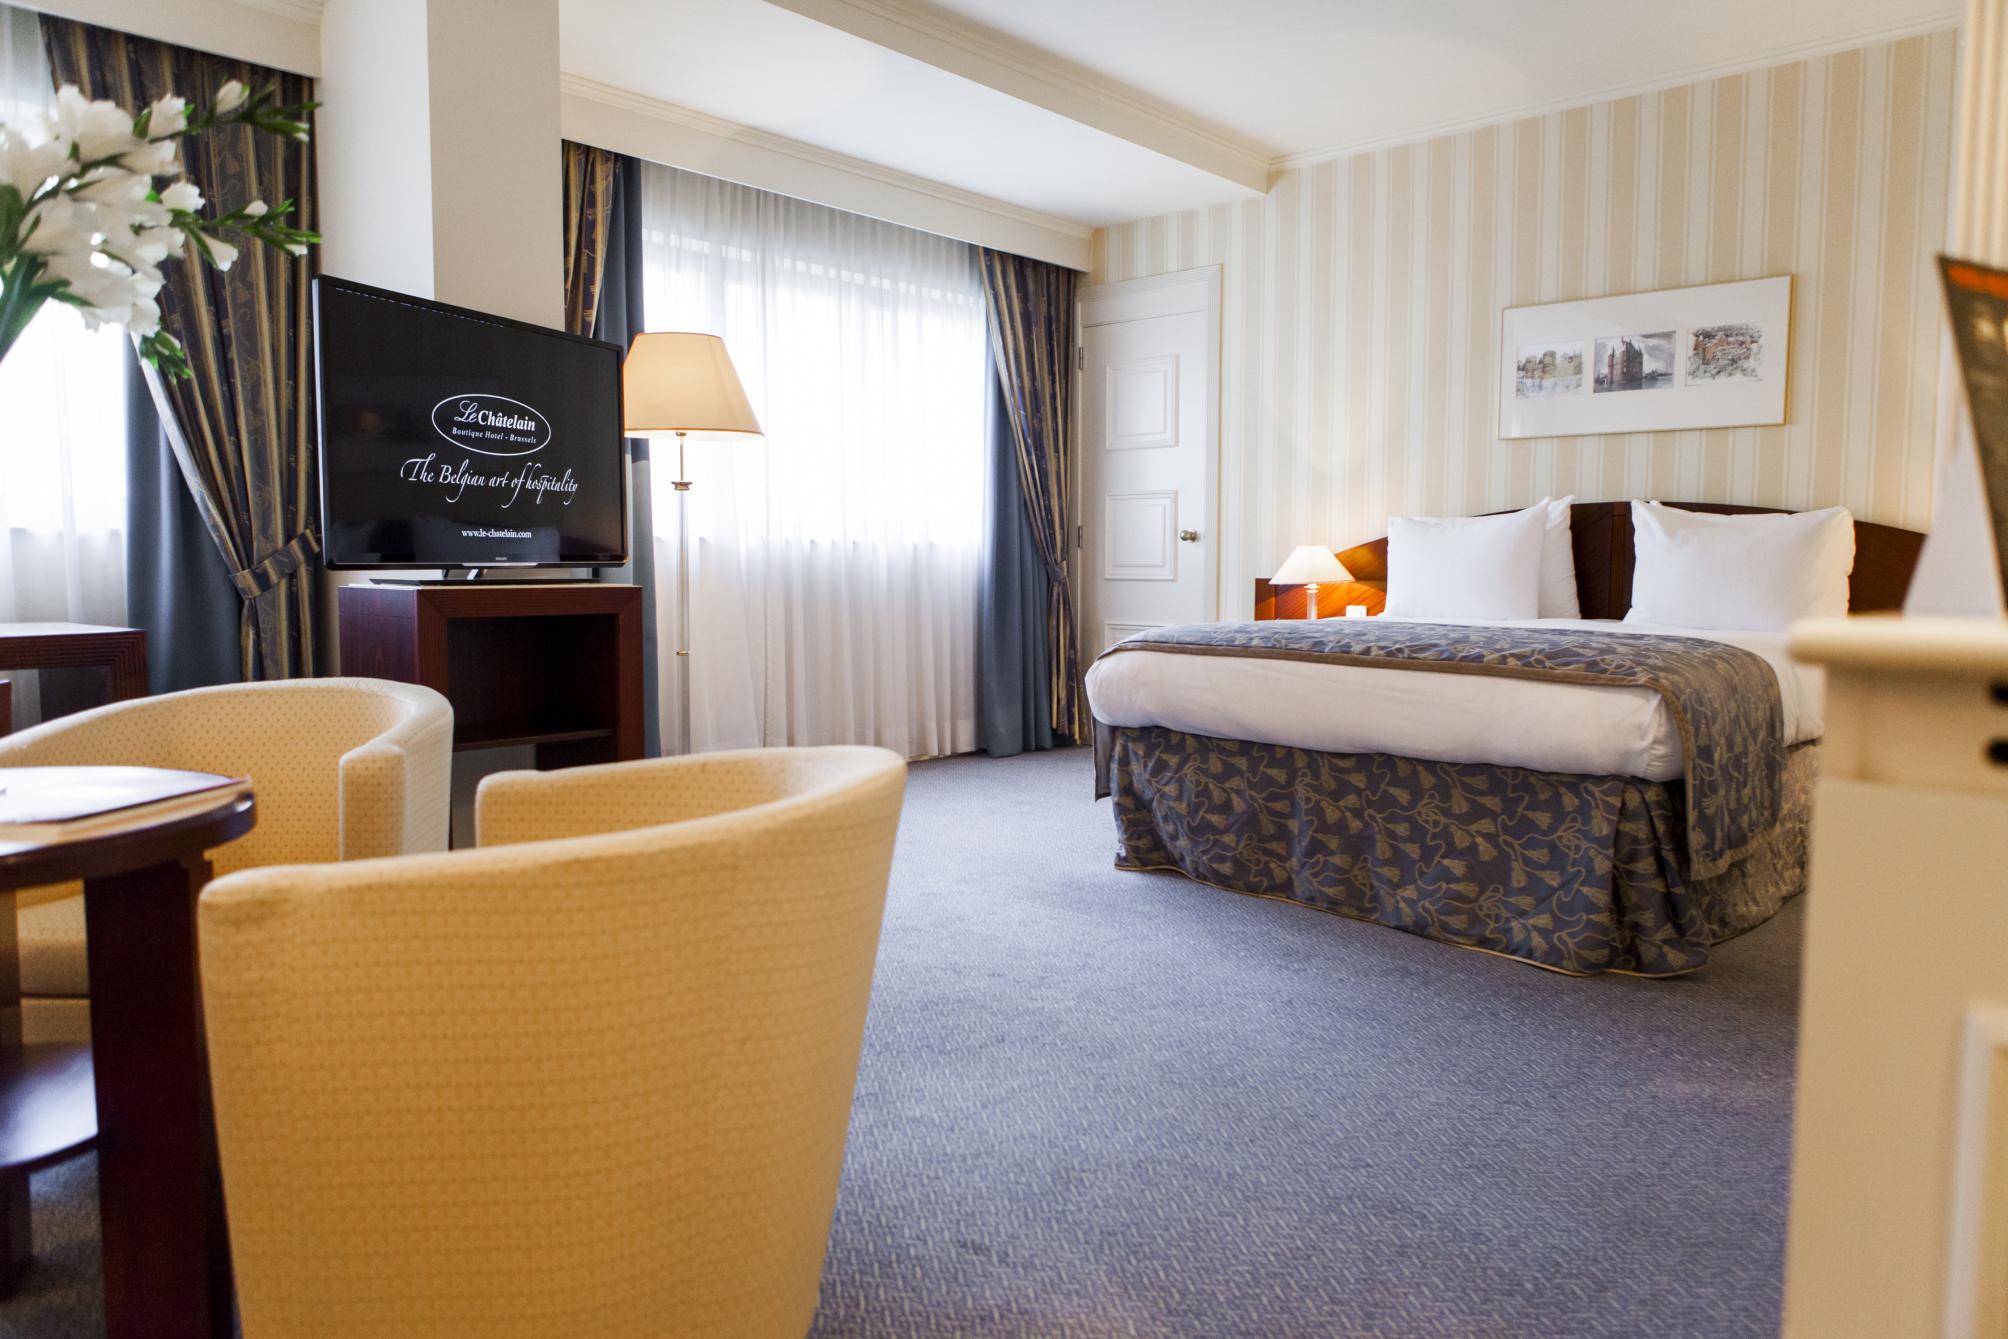 HotelLe Chatelain